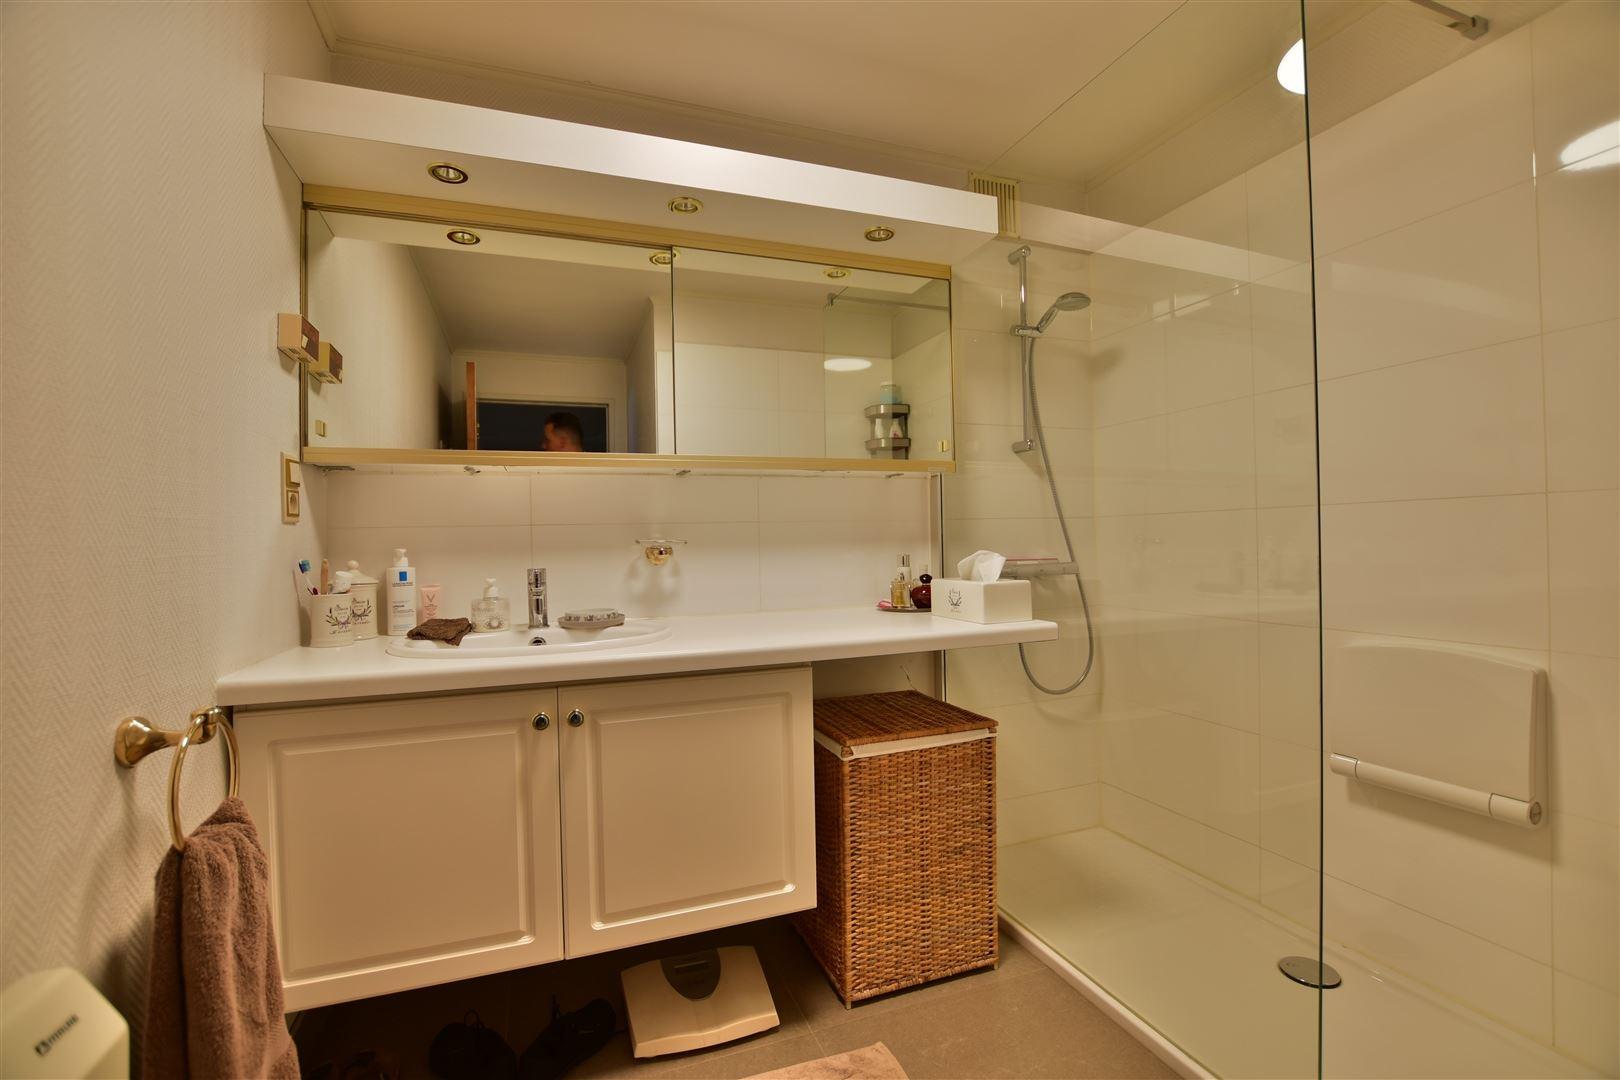 Foto 6 : Appartement te 9140 TEMSE (België) - Prijs € 299.000